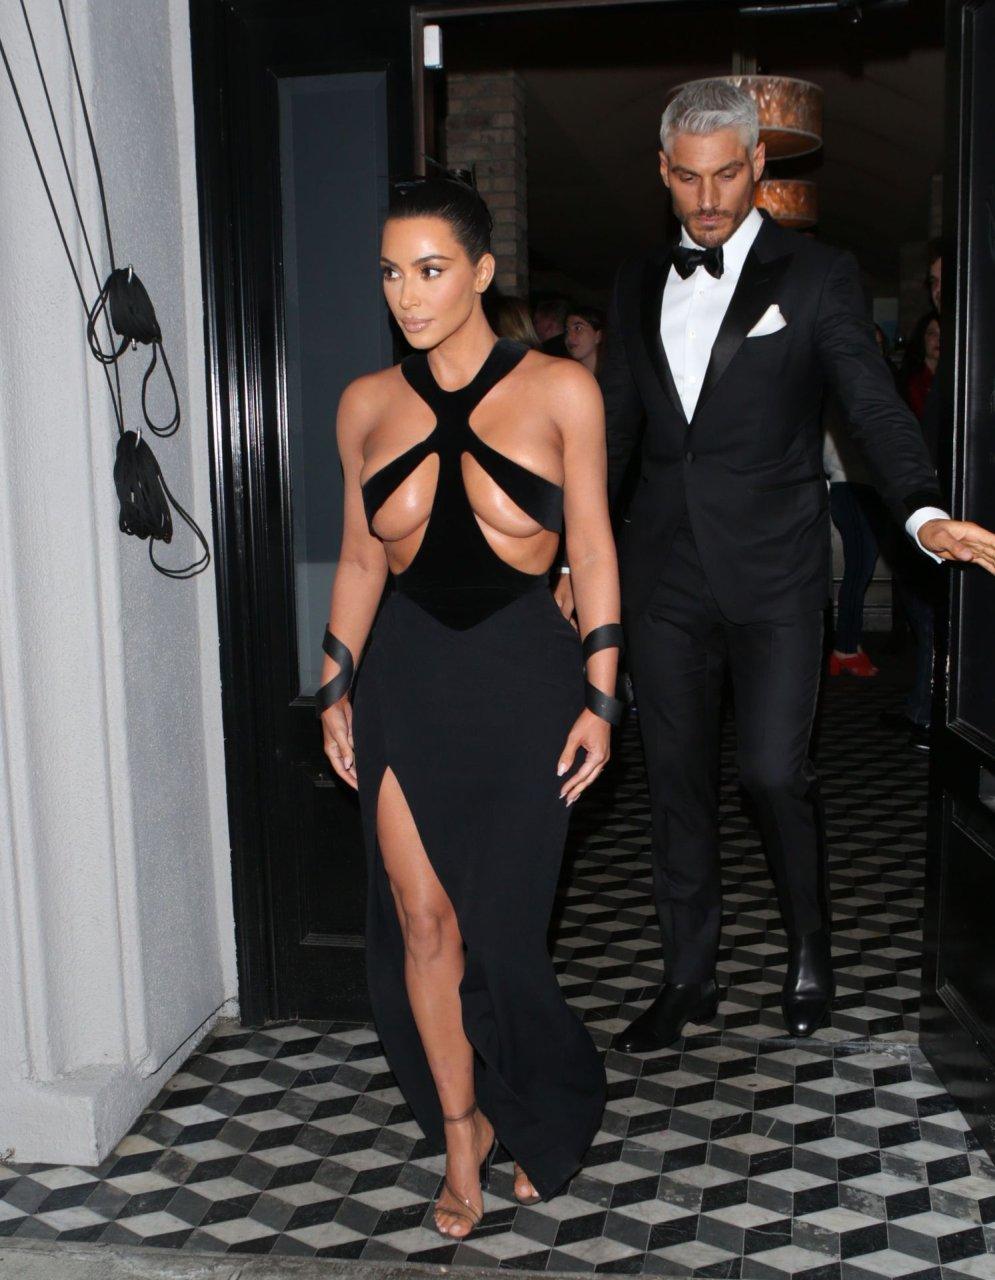 Kim-Kardashian-Topless-TheFappeningBlog.com-5.jpg